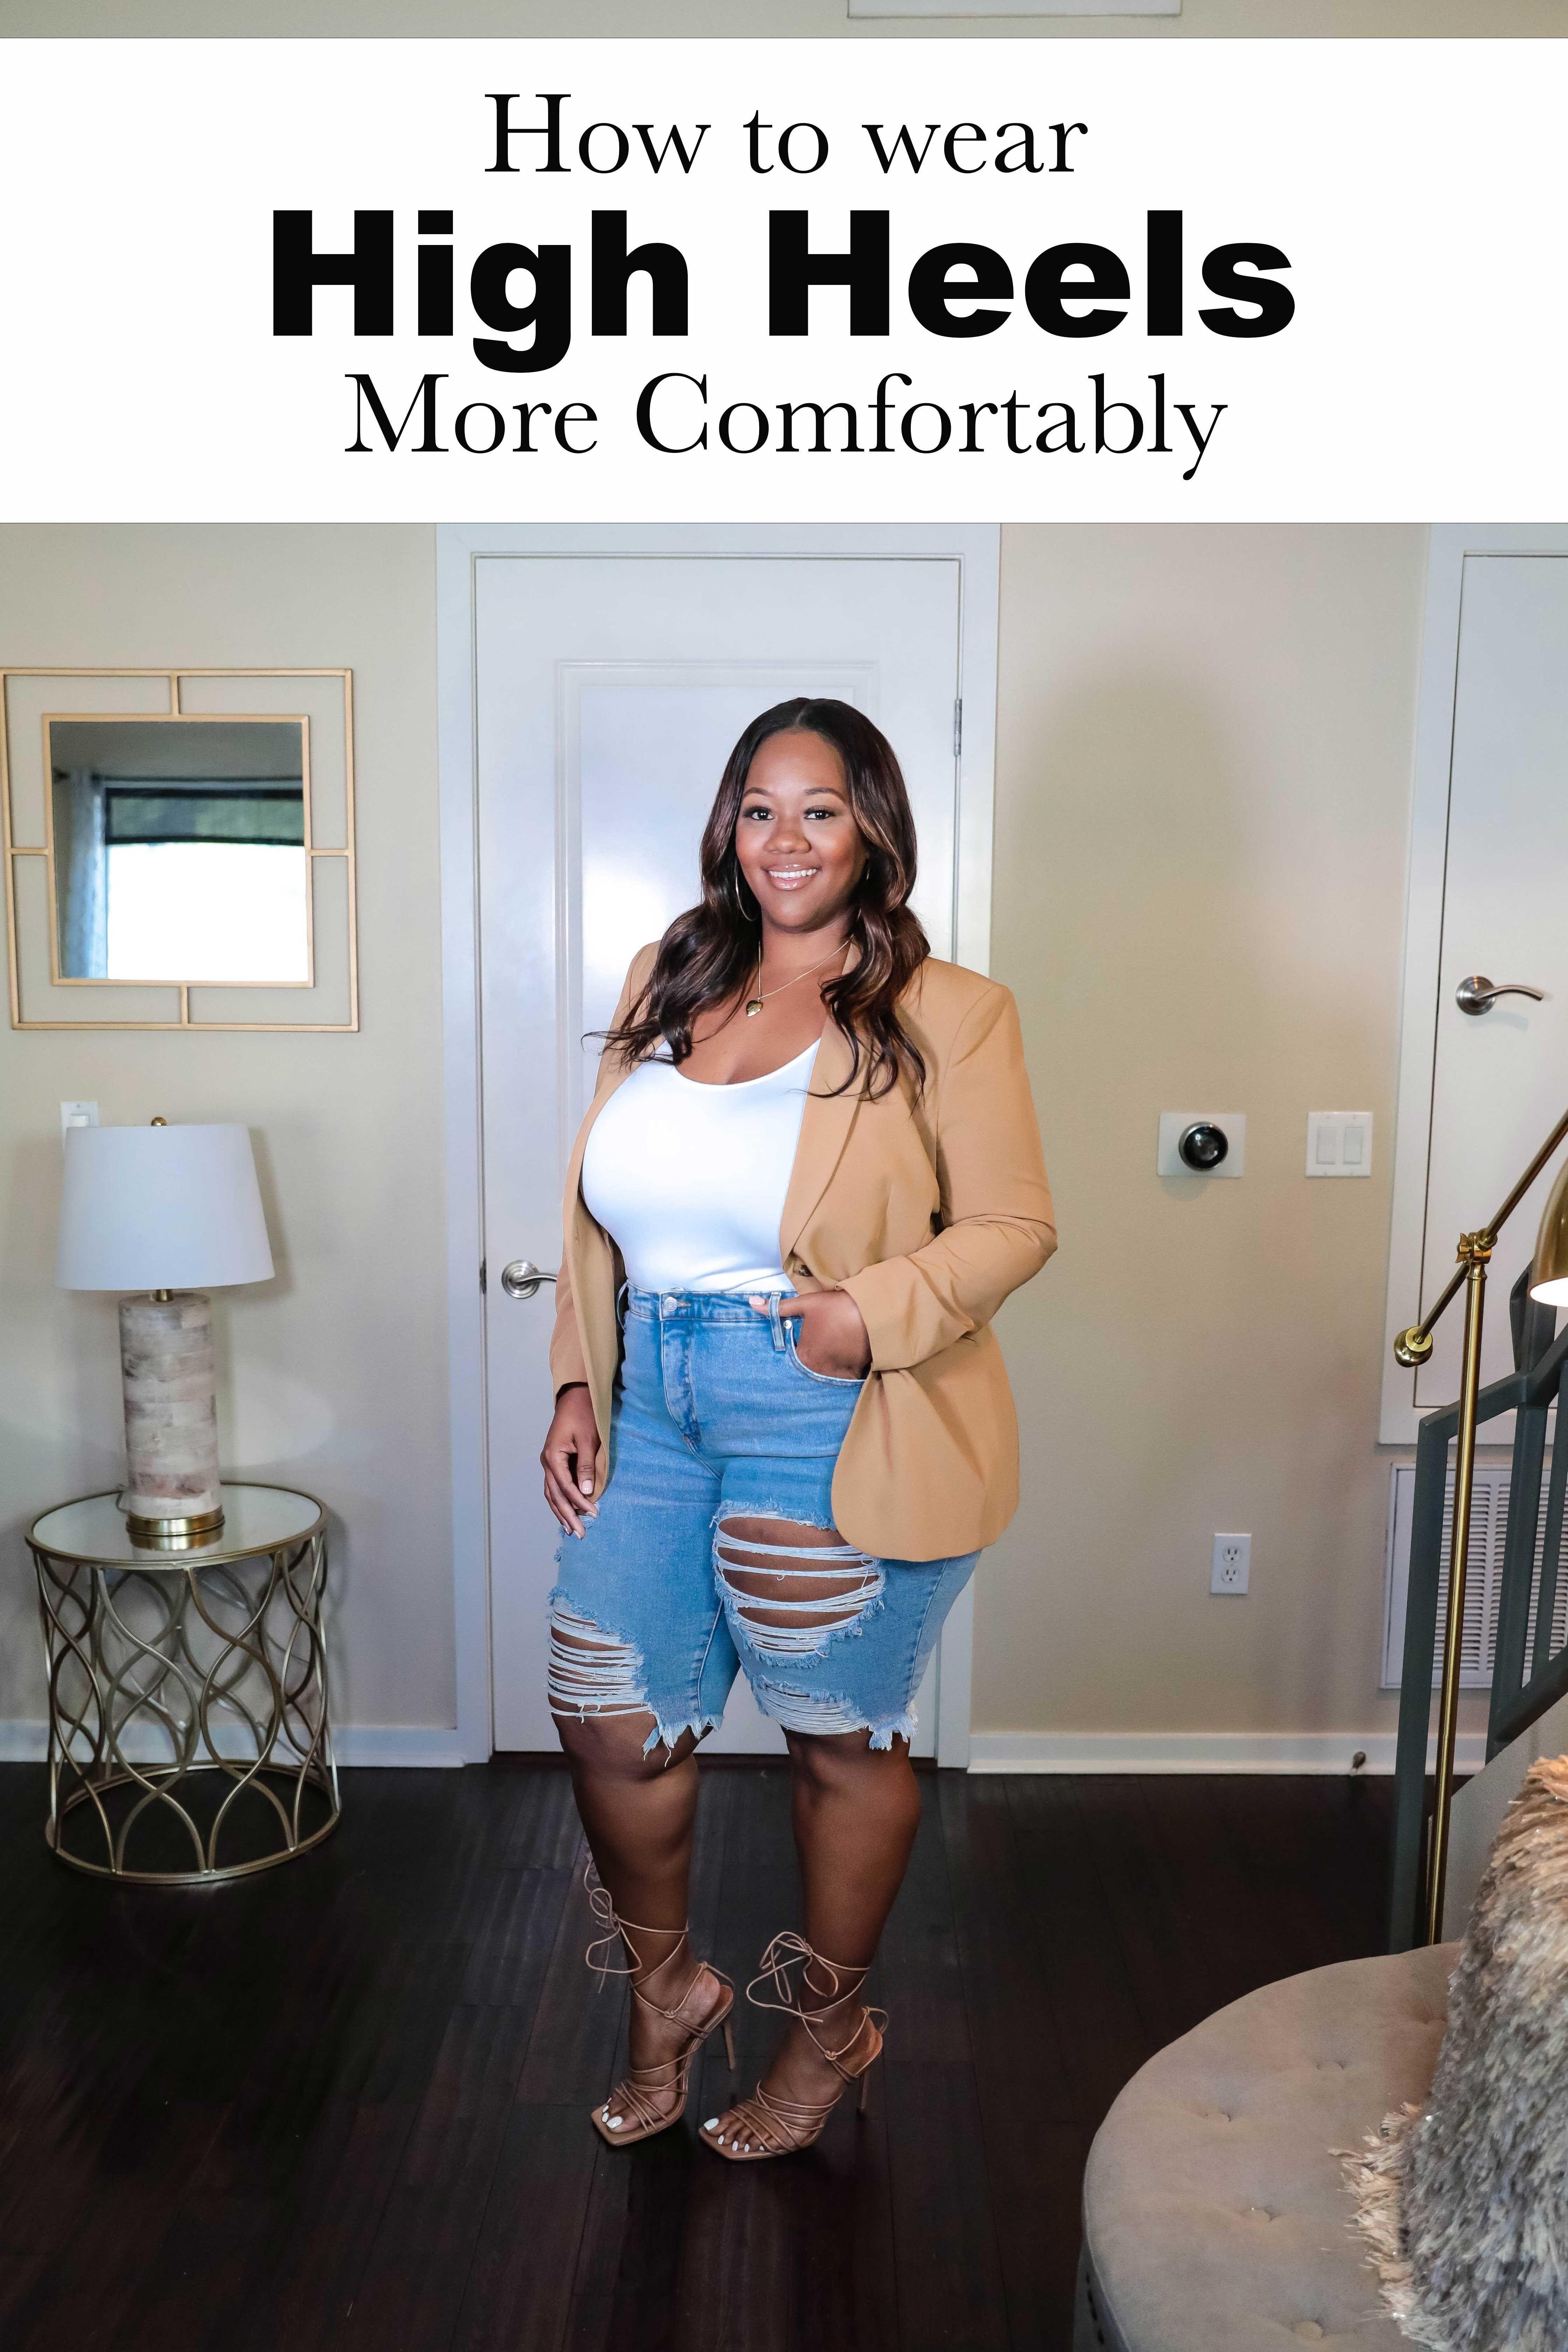 850 Plus Size Outfits Ideas In 2021 Plus Size Outfits Plus Size Fashion Plus Size